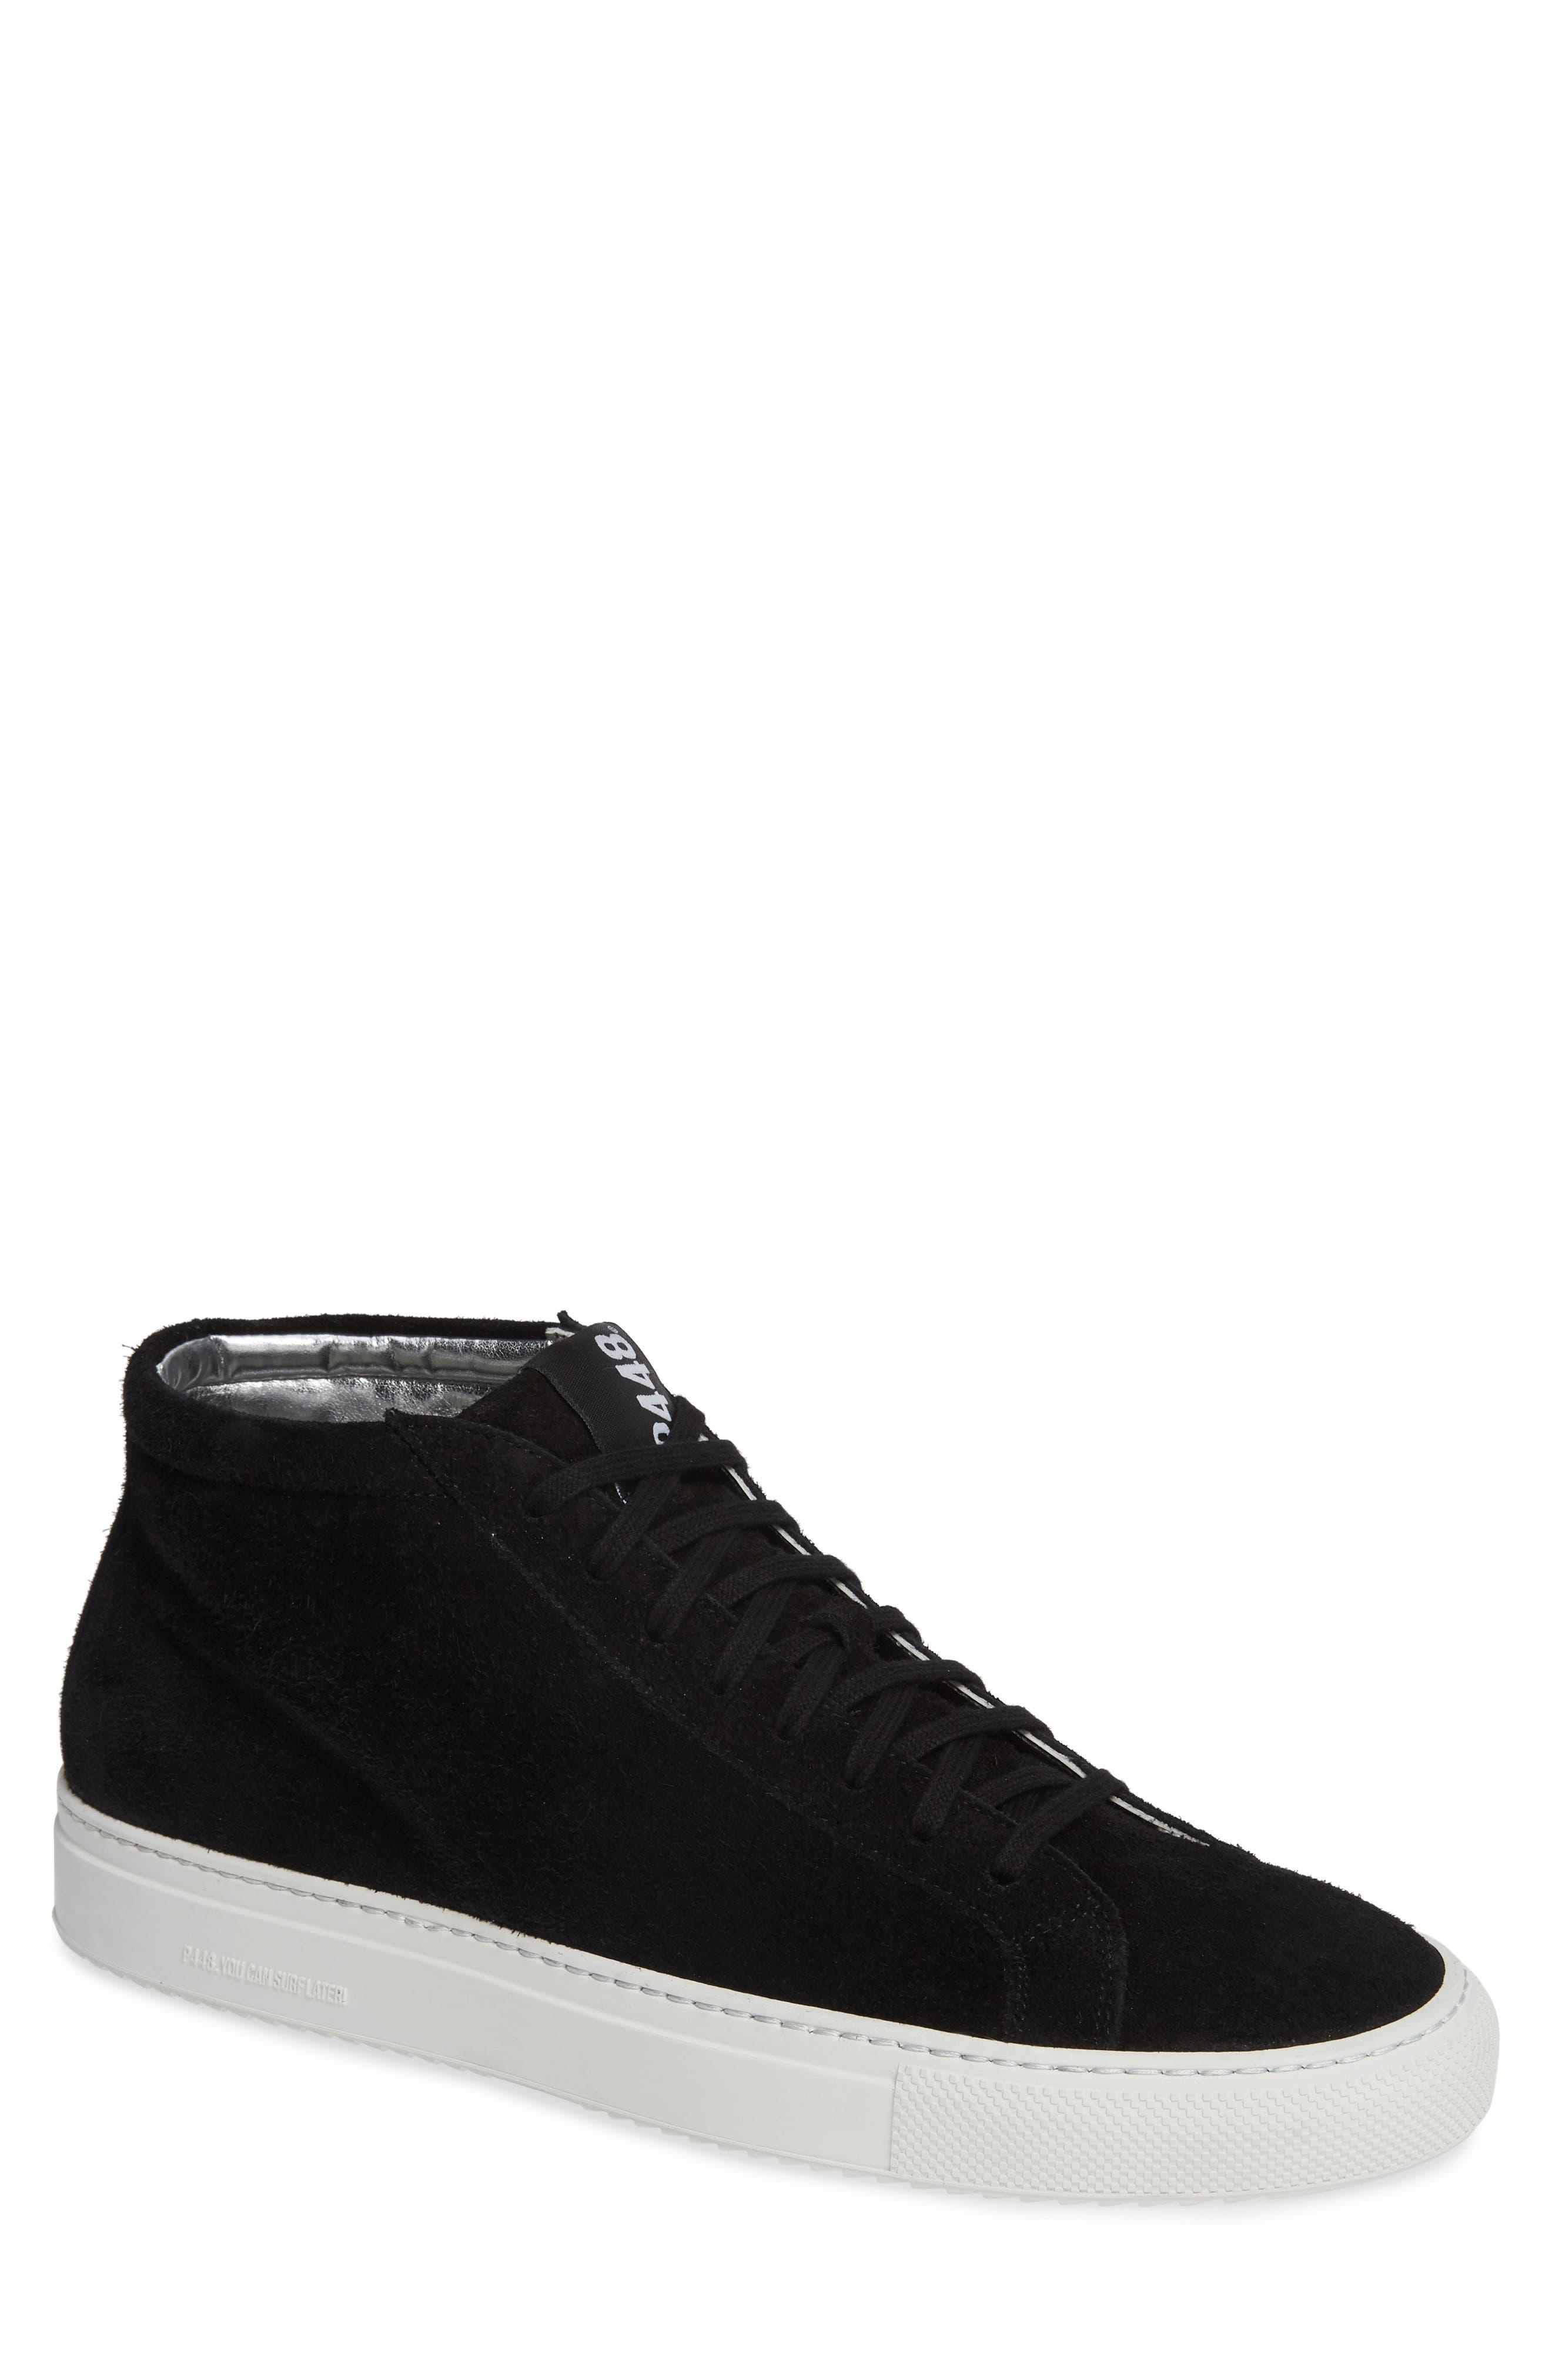 A8Elevent Mid Sneaker,                             Main thumbnail 1, color,                             BLACK BRUSH